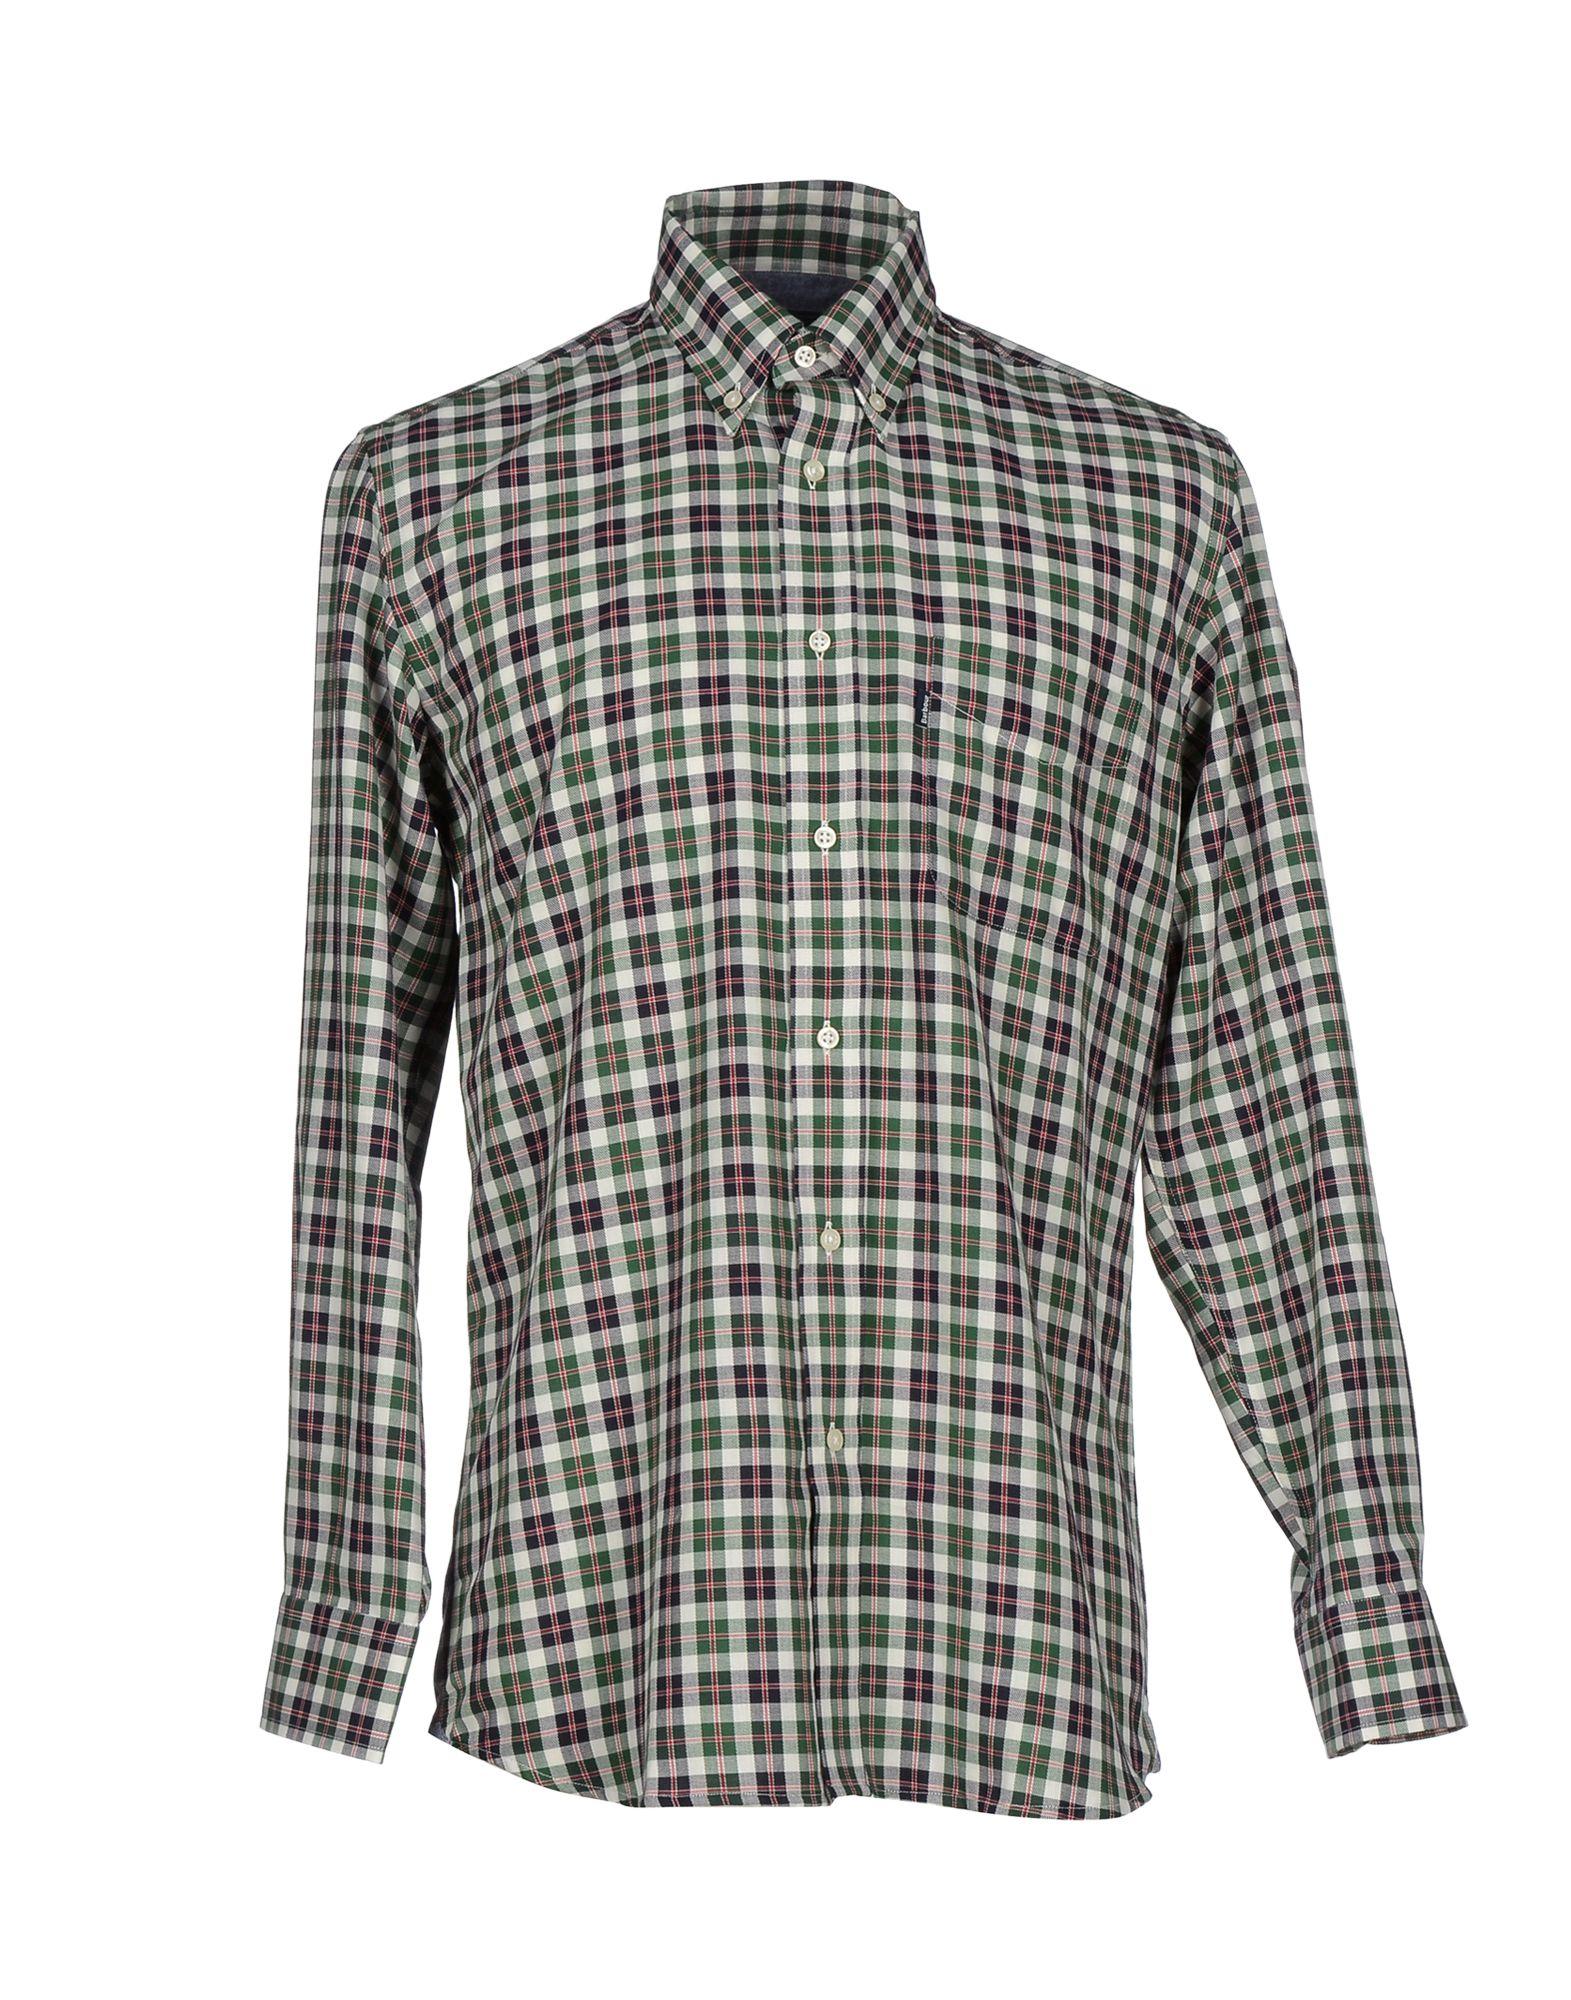 Barbour Shirt In Black For Men Lyst